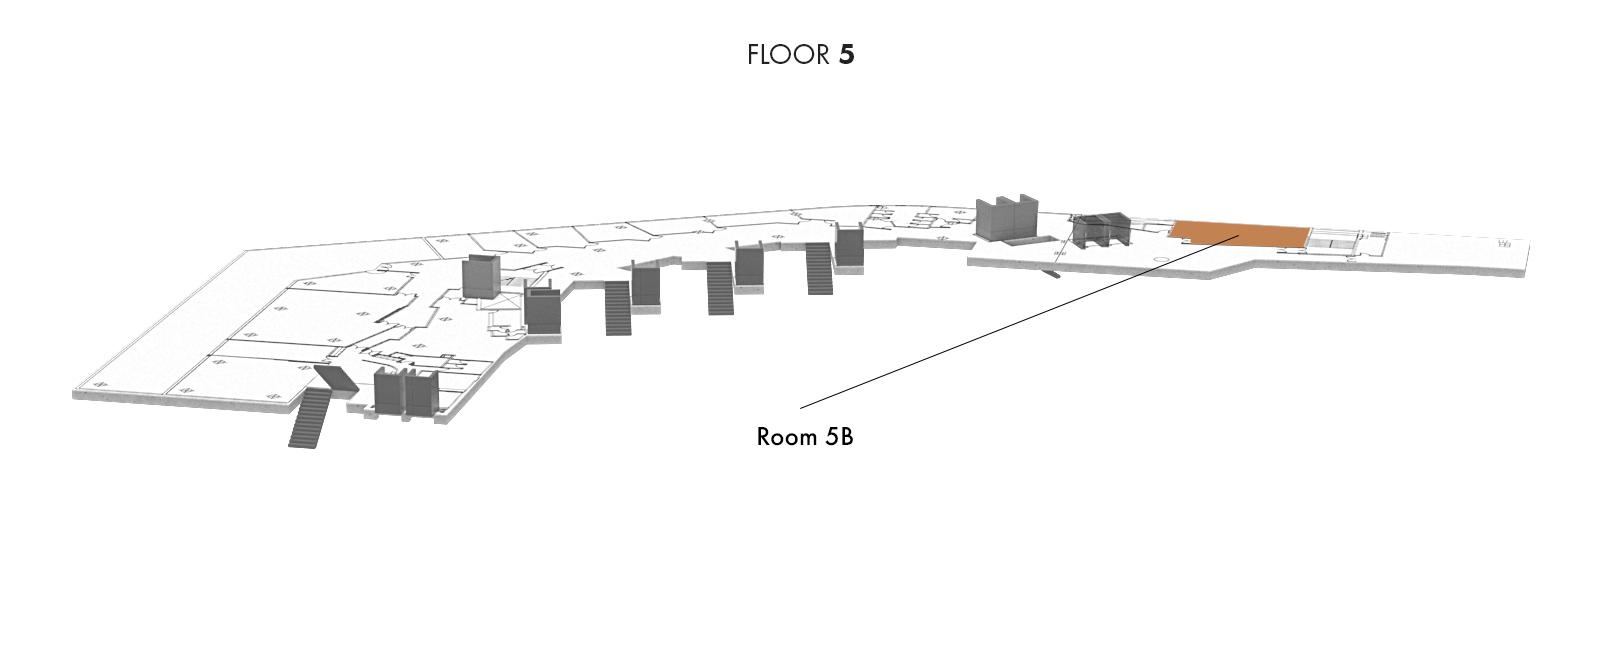 Room 5B, Floor 5| Palacio Euskalduna Jauregia